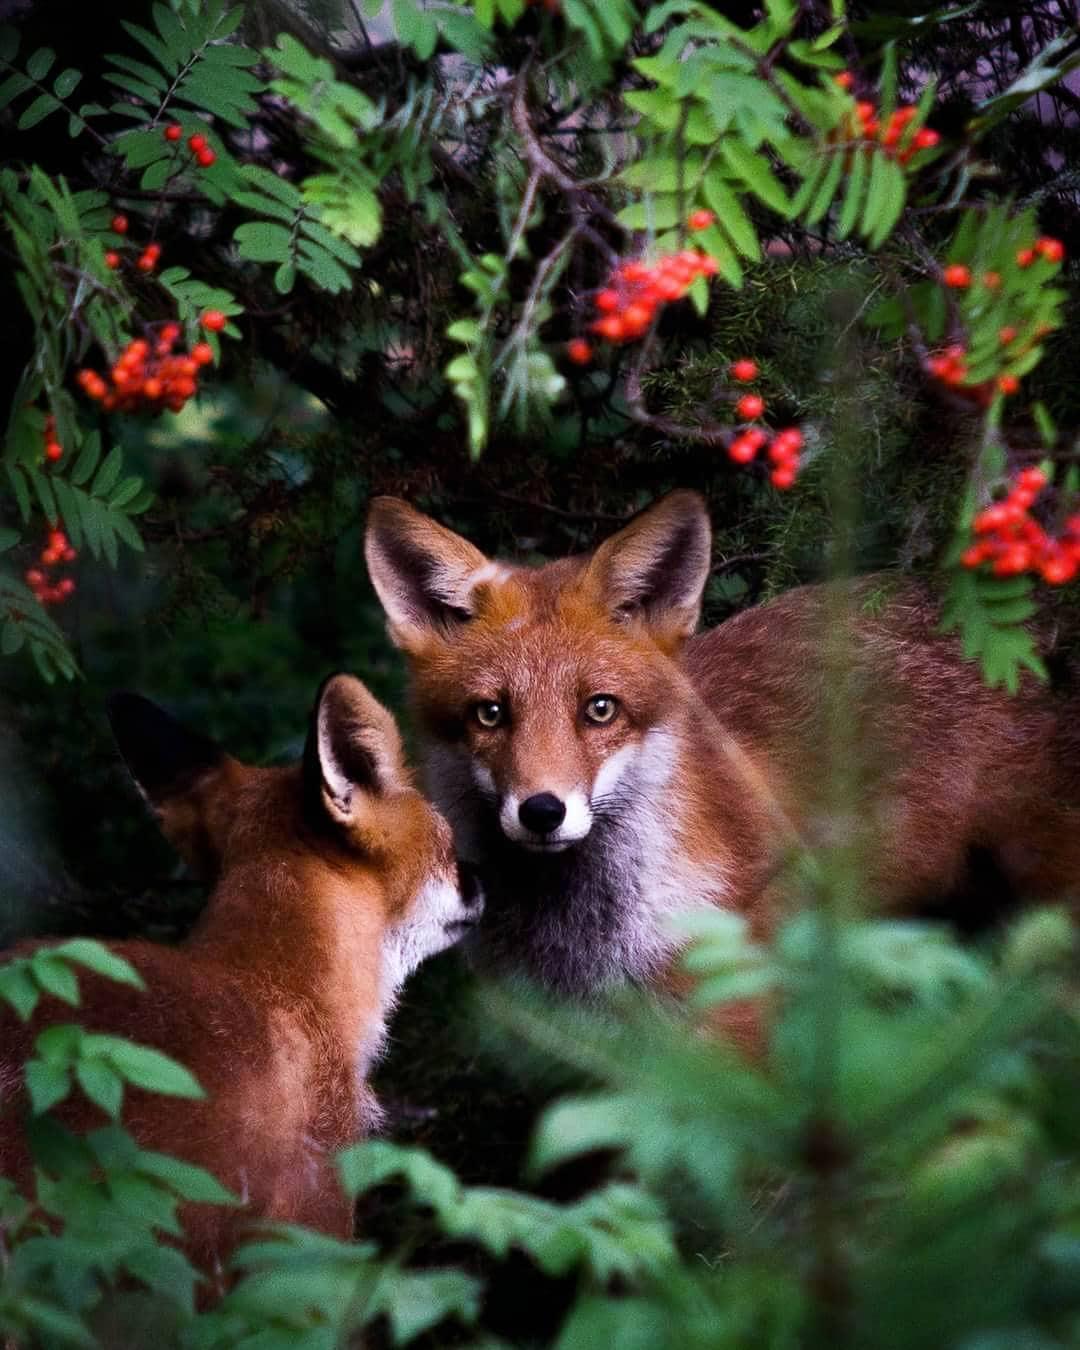 Photos Capture Finland S Fairytale Forest Animals In The Wild